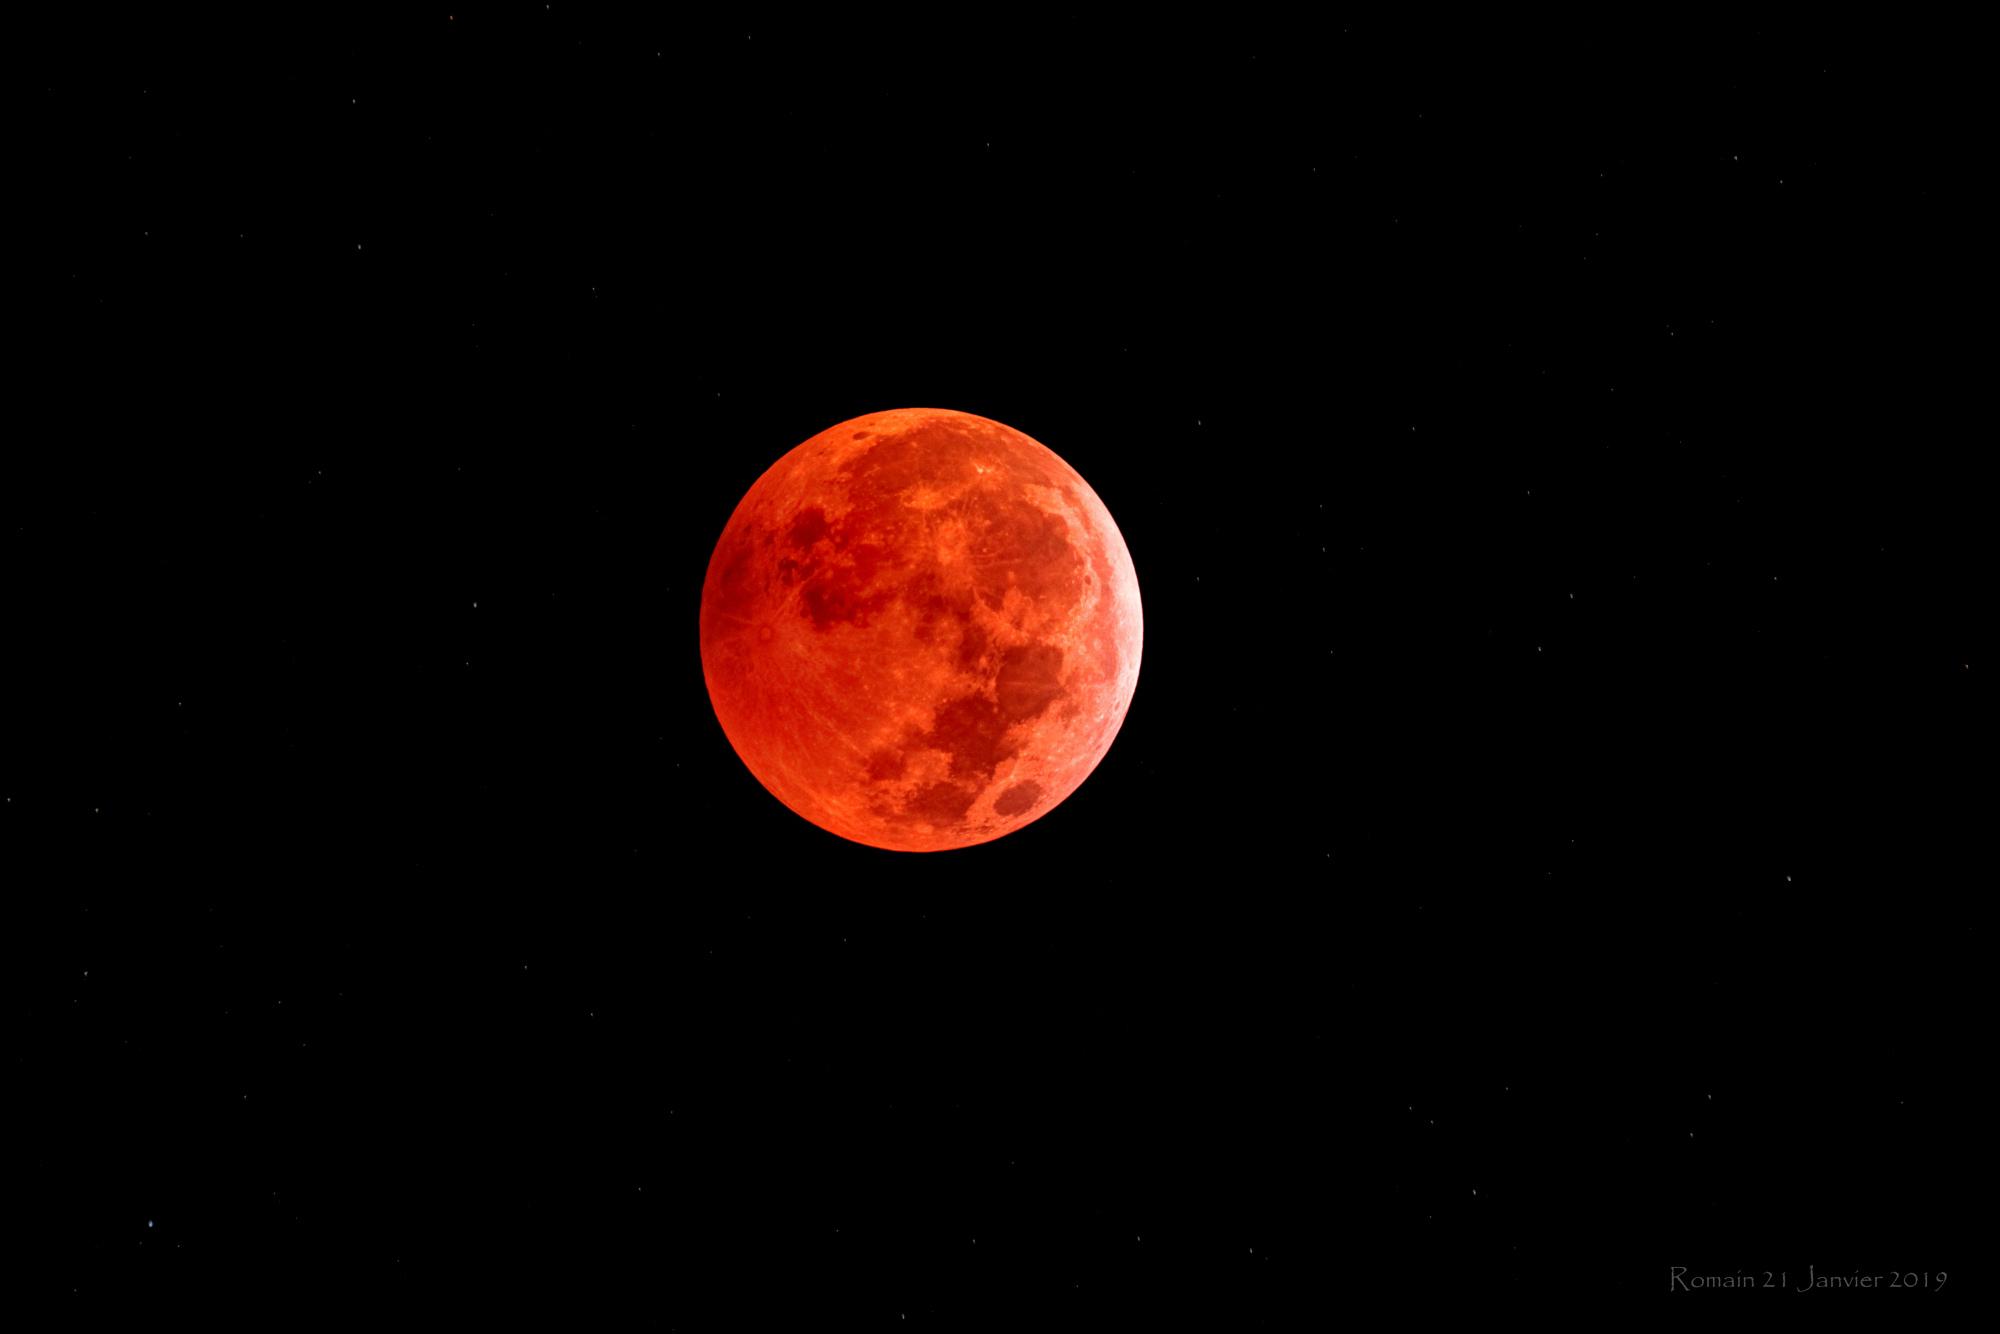 Eclipse de Lune 21 Janvier 2019.jpg